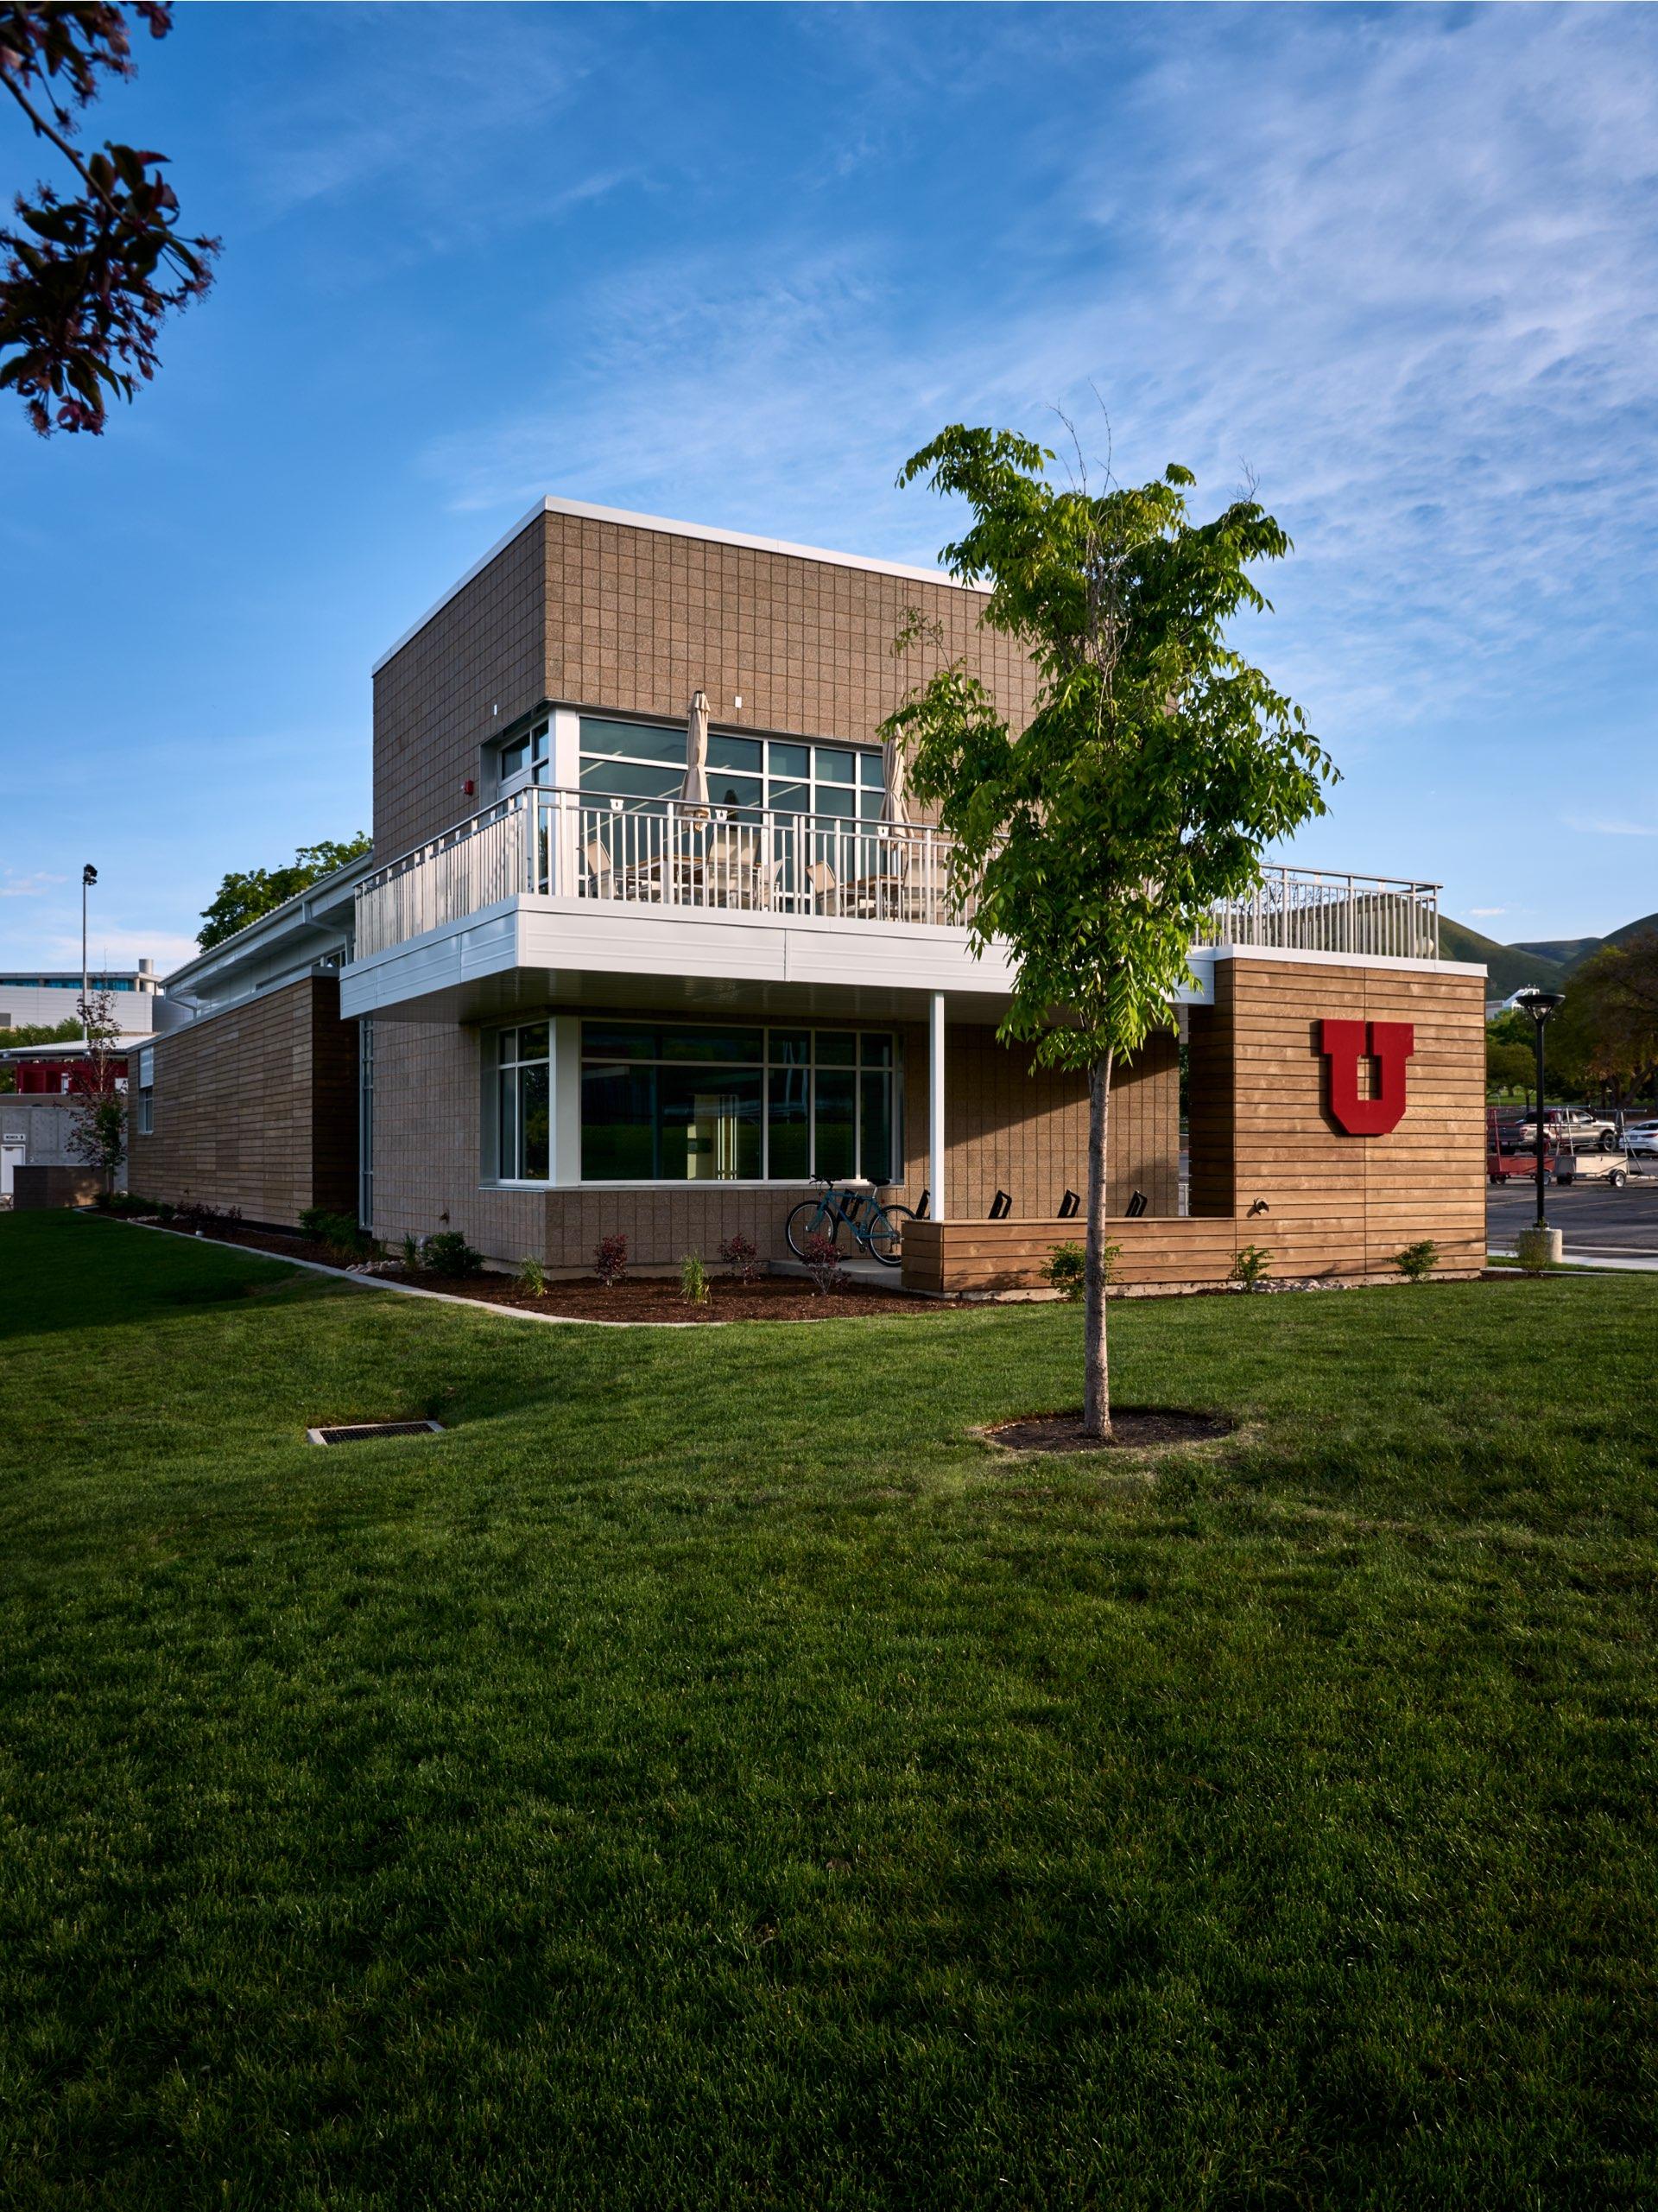 Exterior, University of Utah Ski Team Building, architectural design by Elliott Workgroup